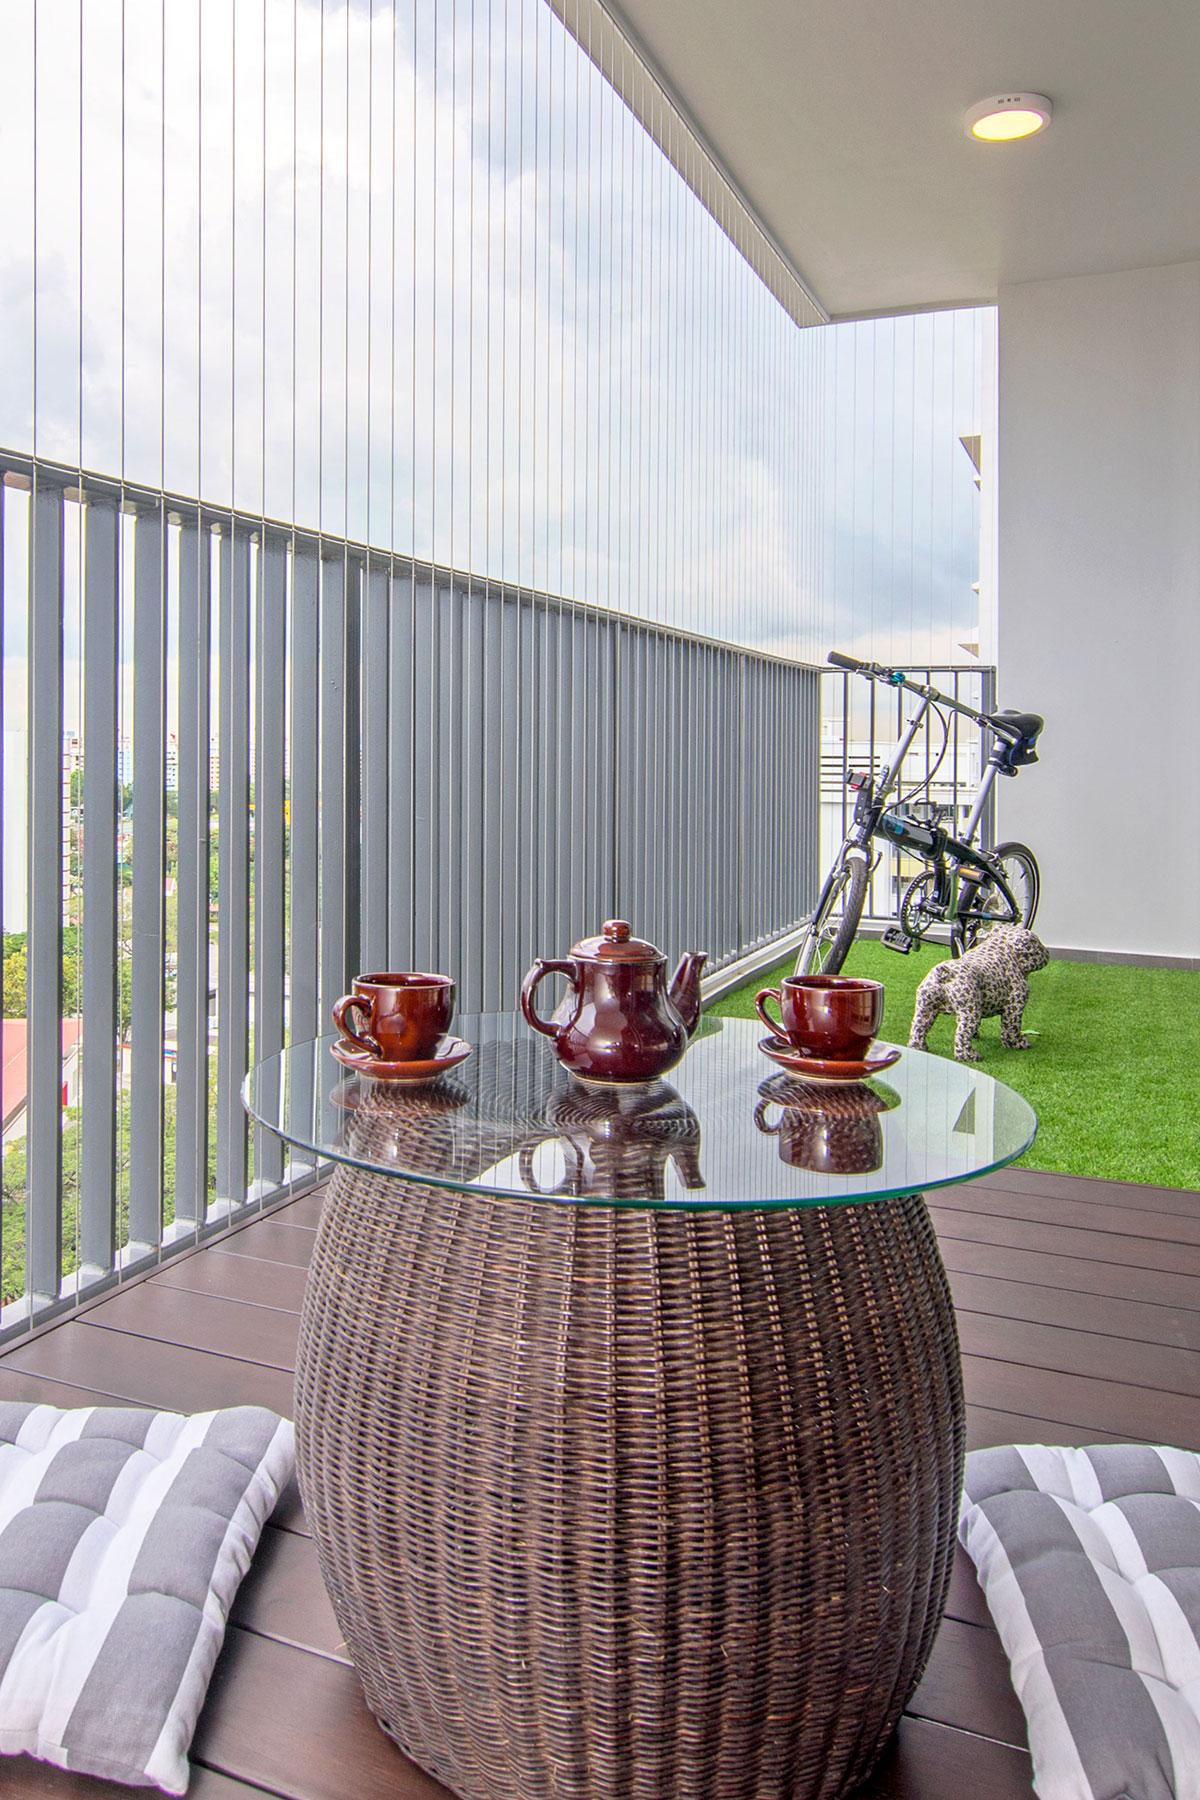 Beach house urban apartment in Singapore by Vievva Designers-01